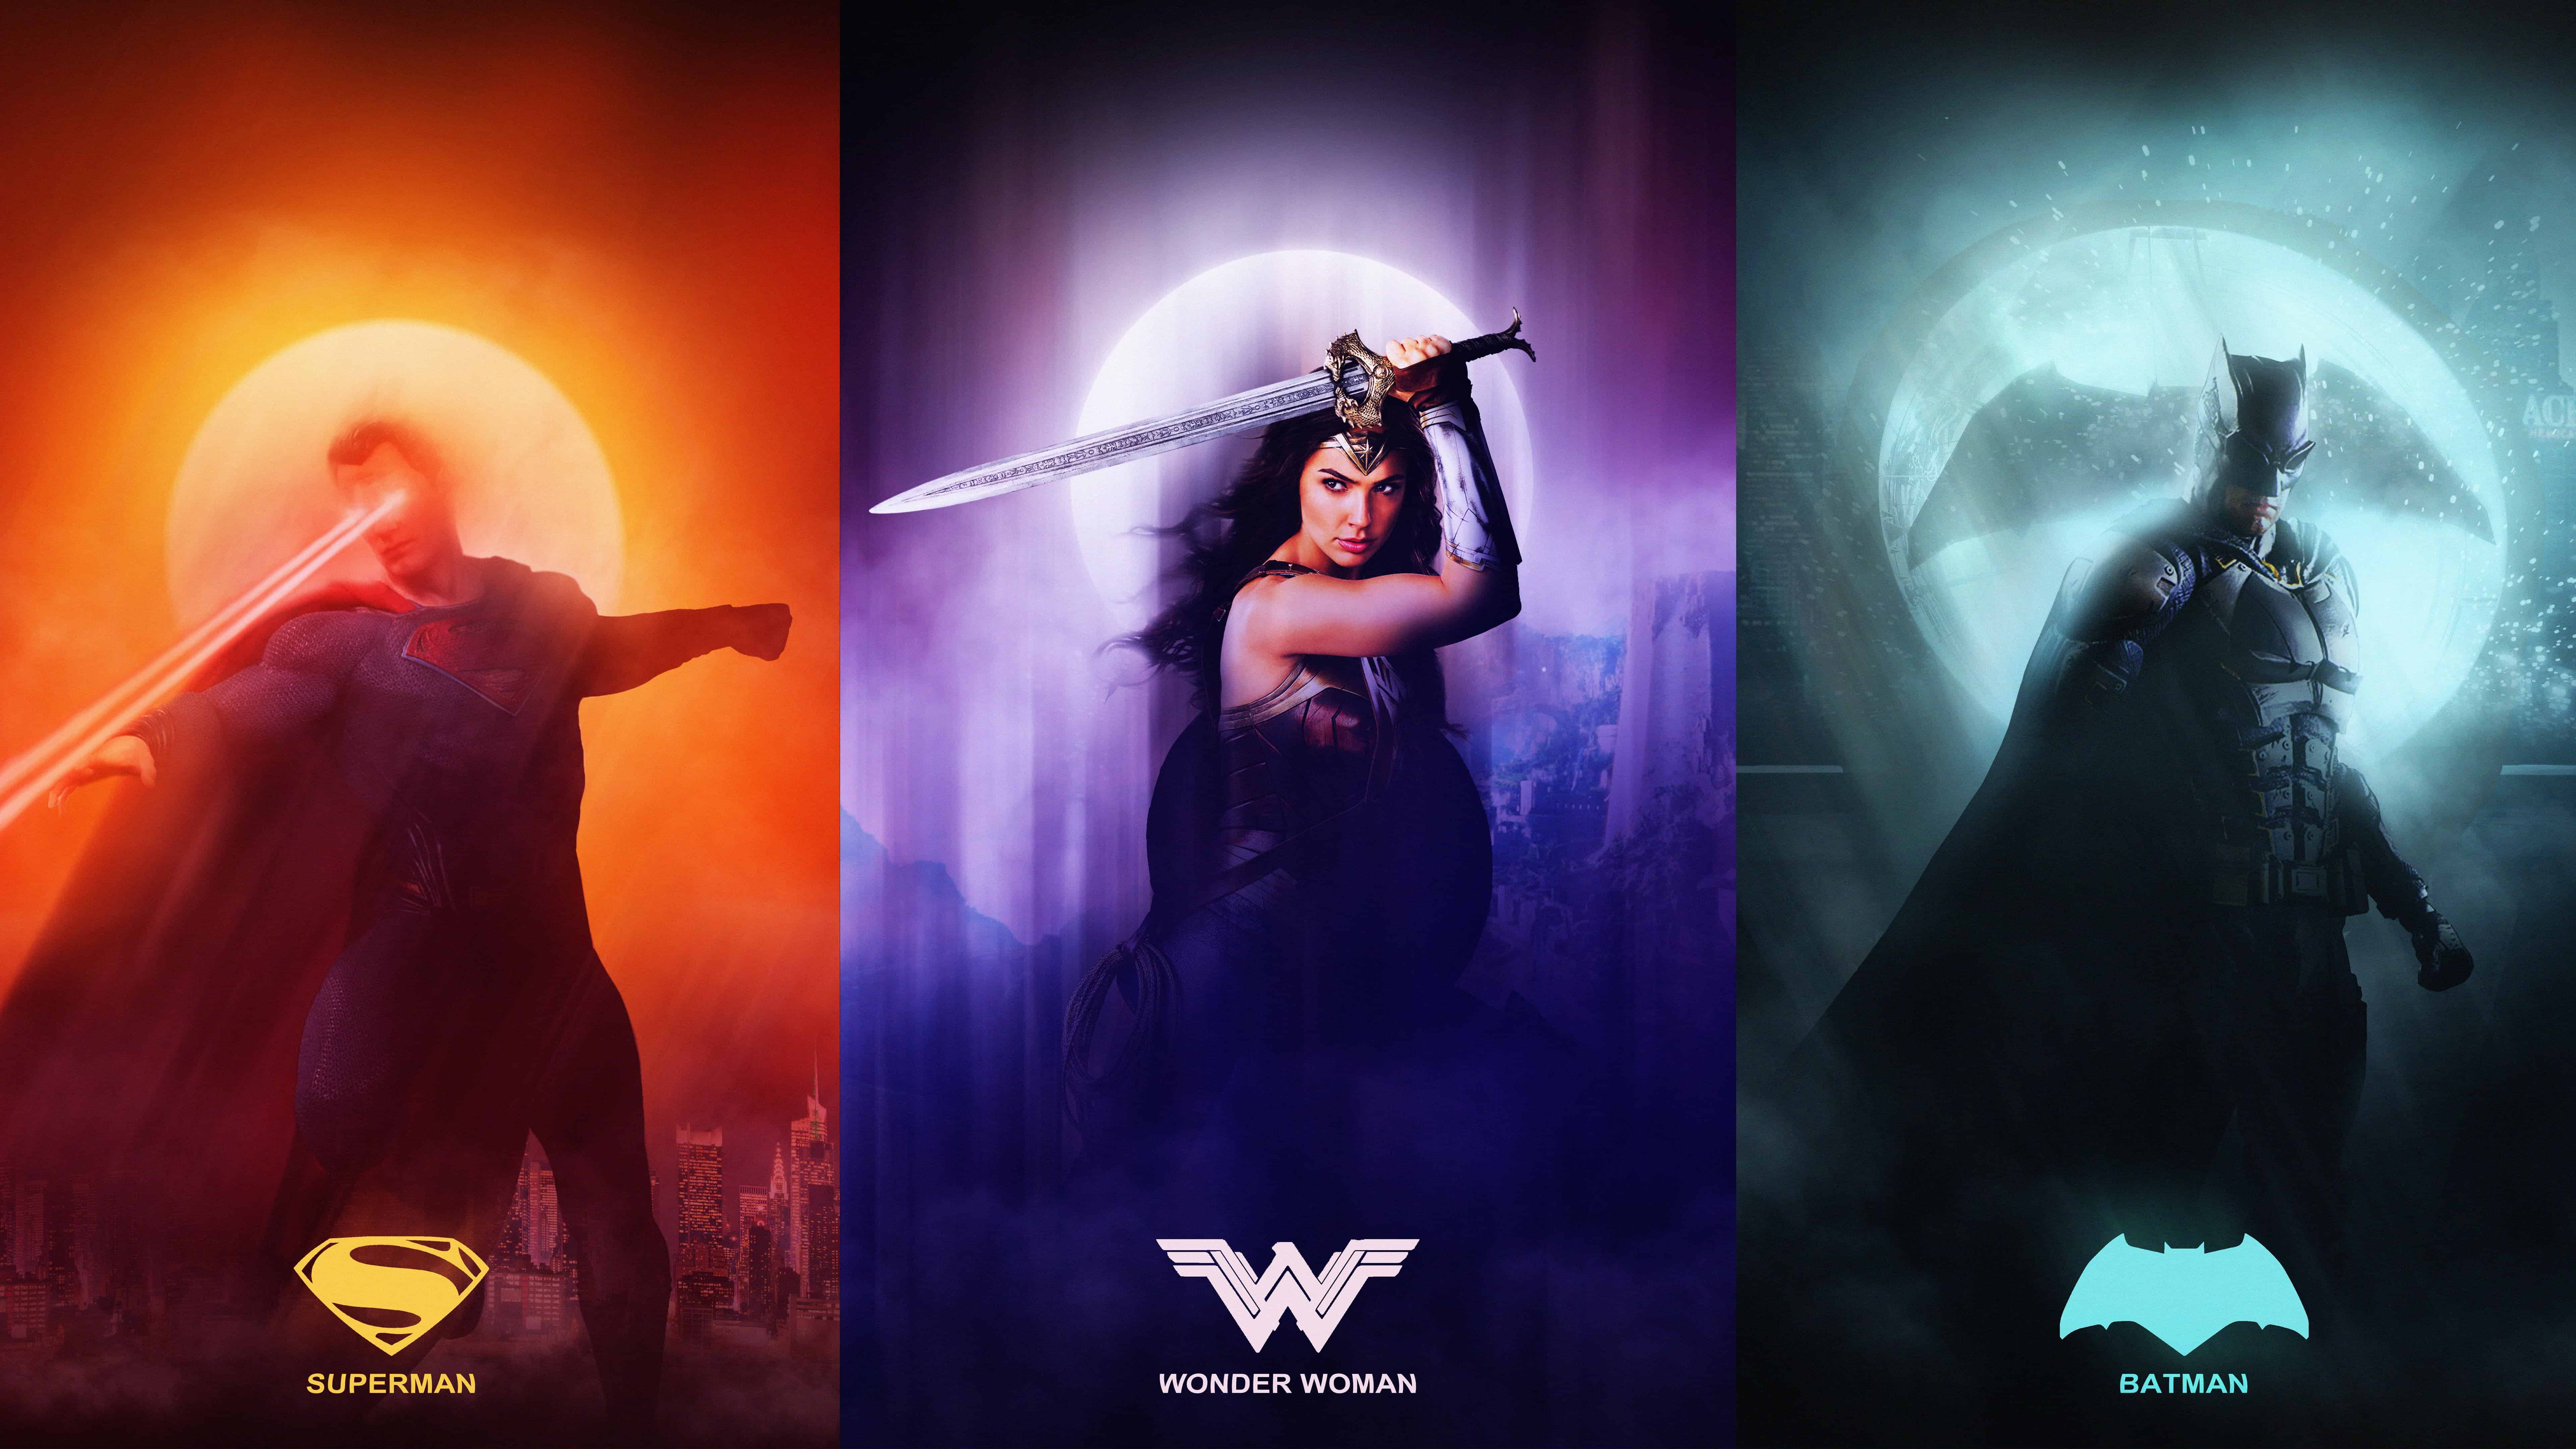 Pixar Cars Desktop Wallpaper Justice League Superman Wonder Woman Batman Uhd 8k